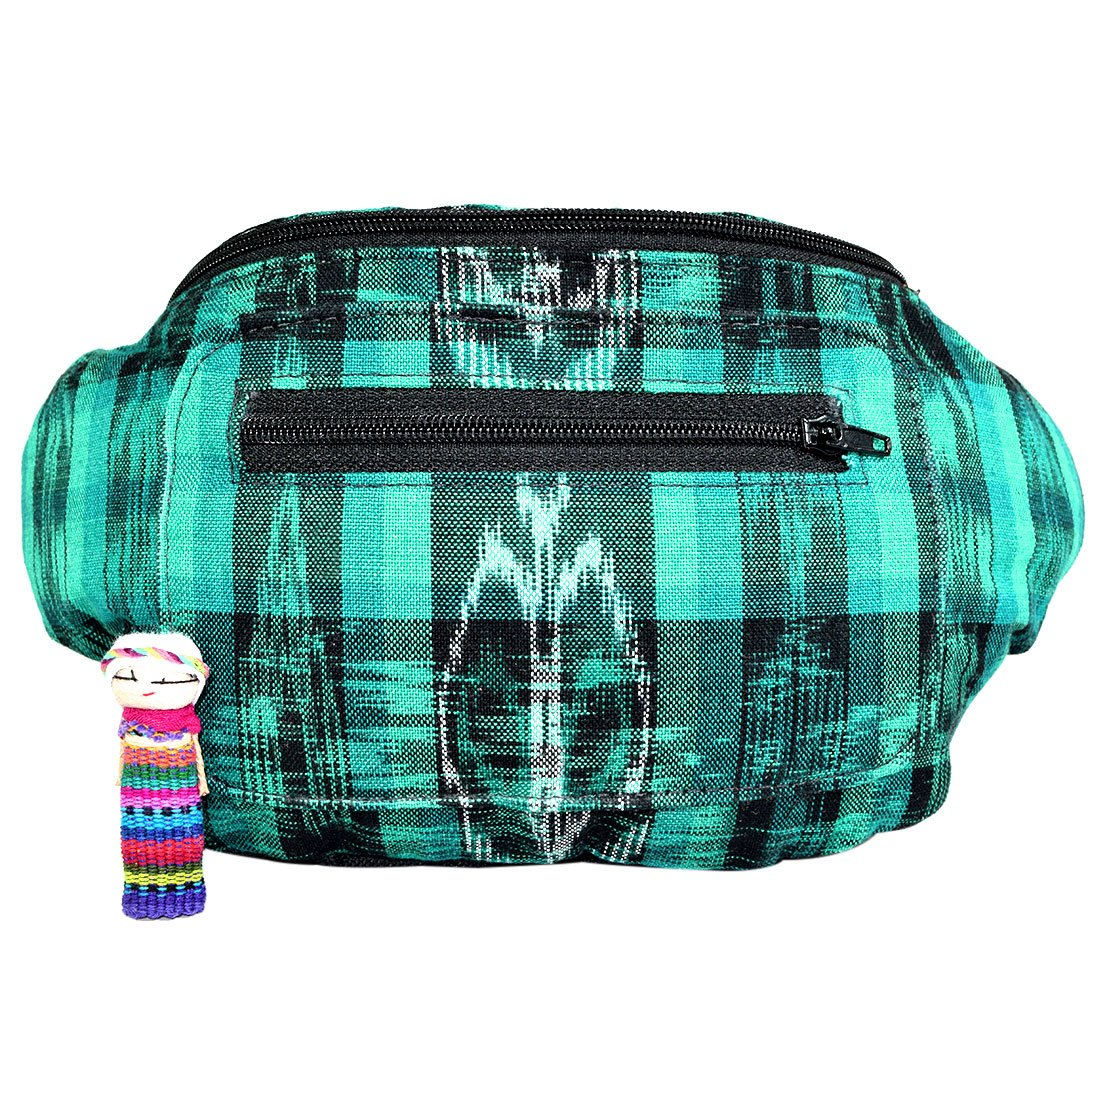 T/ípico Tropical Native Tribal Fanny Pack Eco Woven /& Handmade in Guatemala Boho Chic